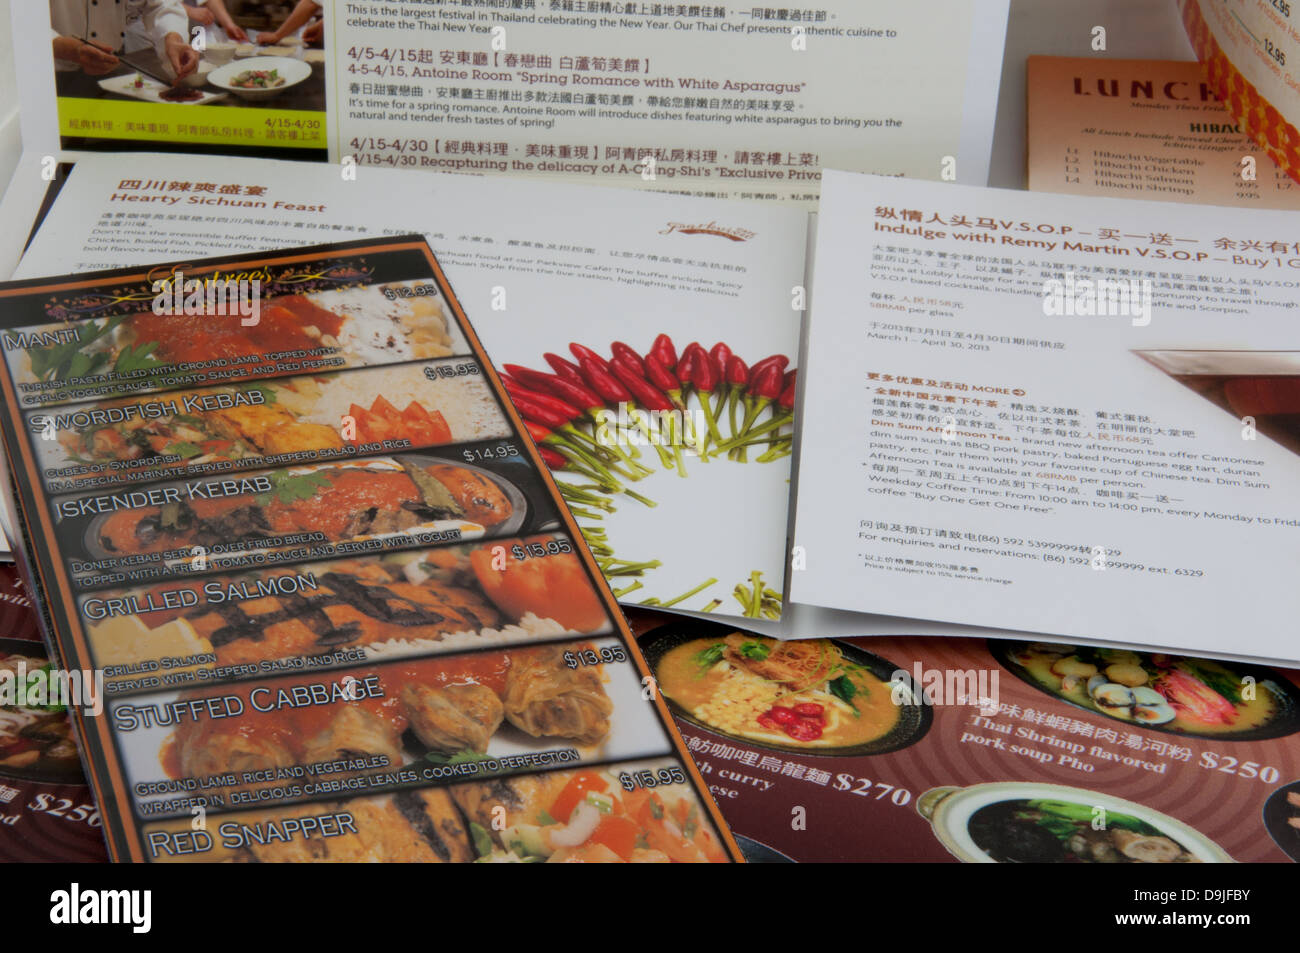 World menus - Stock Image